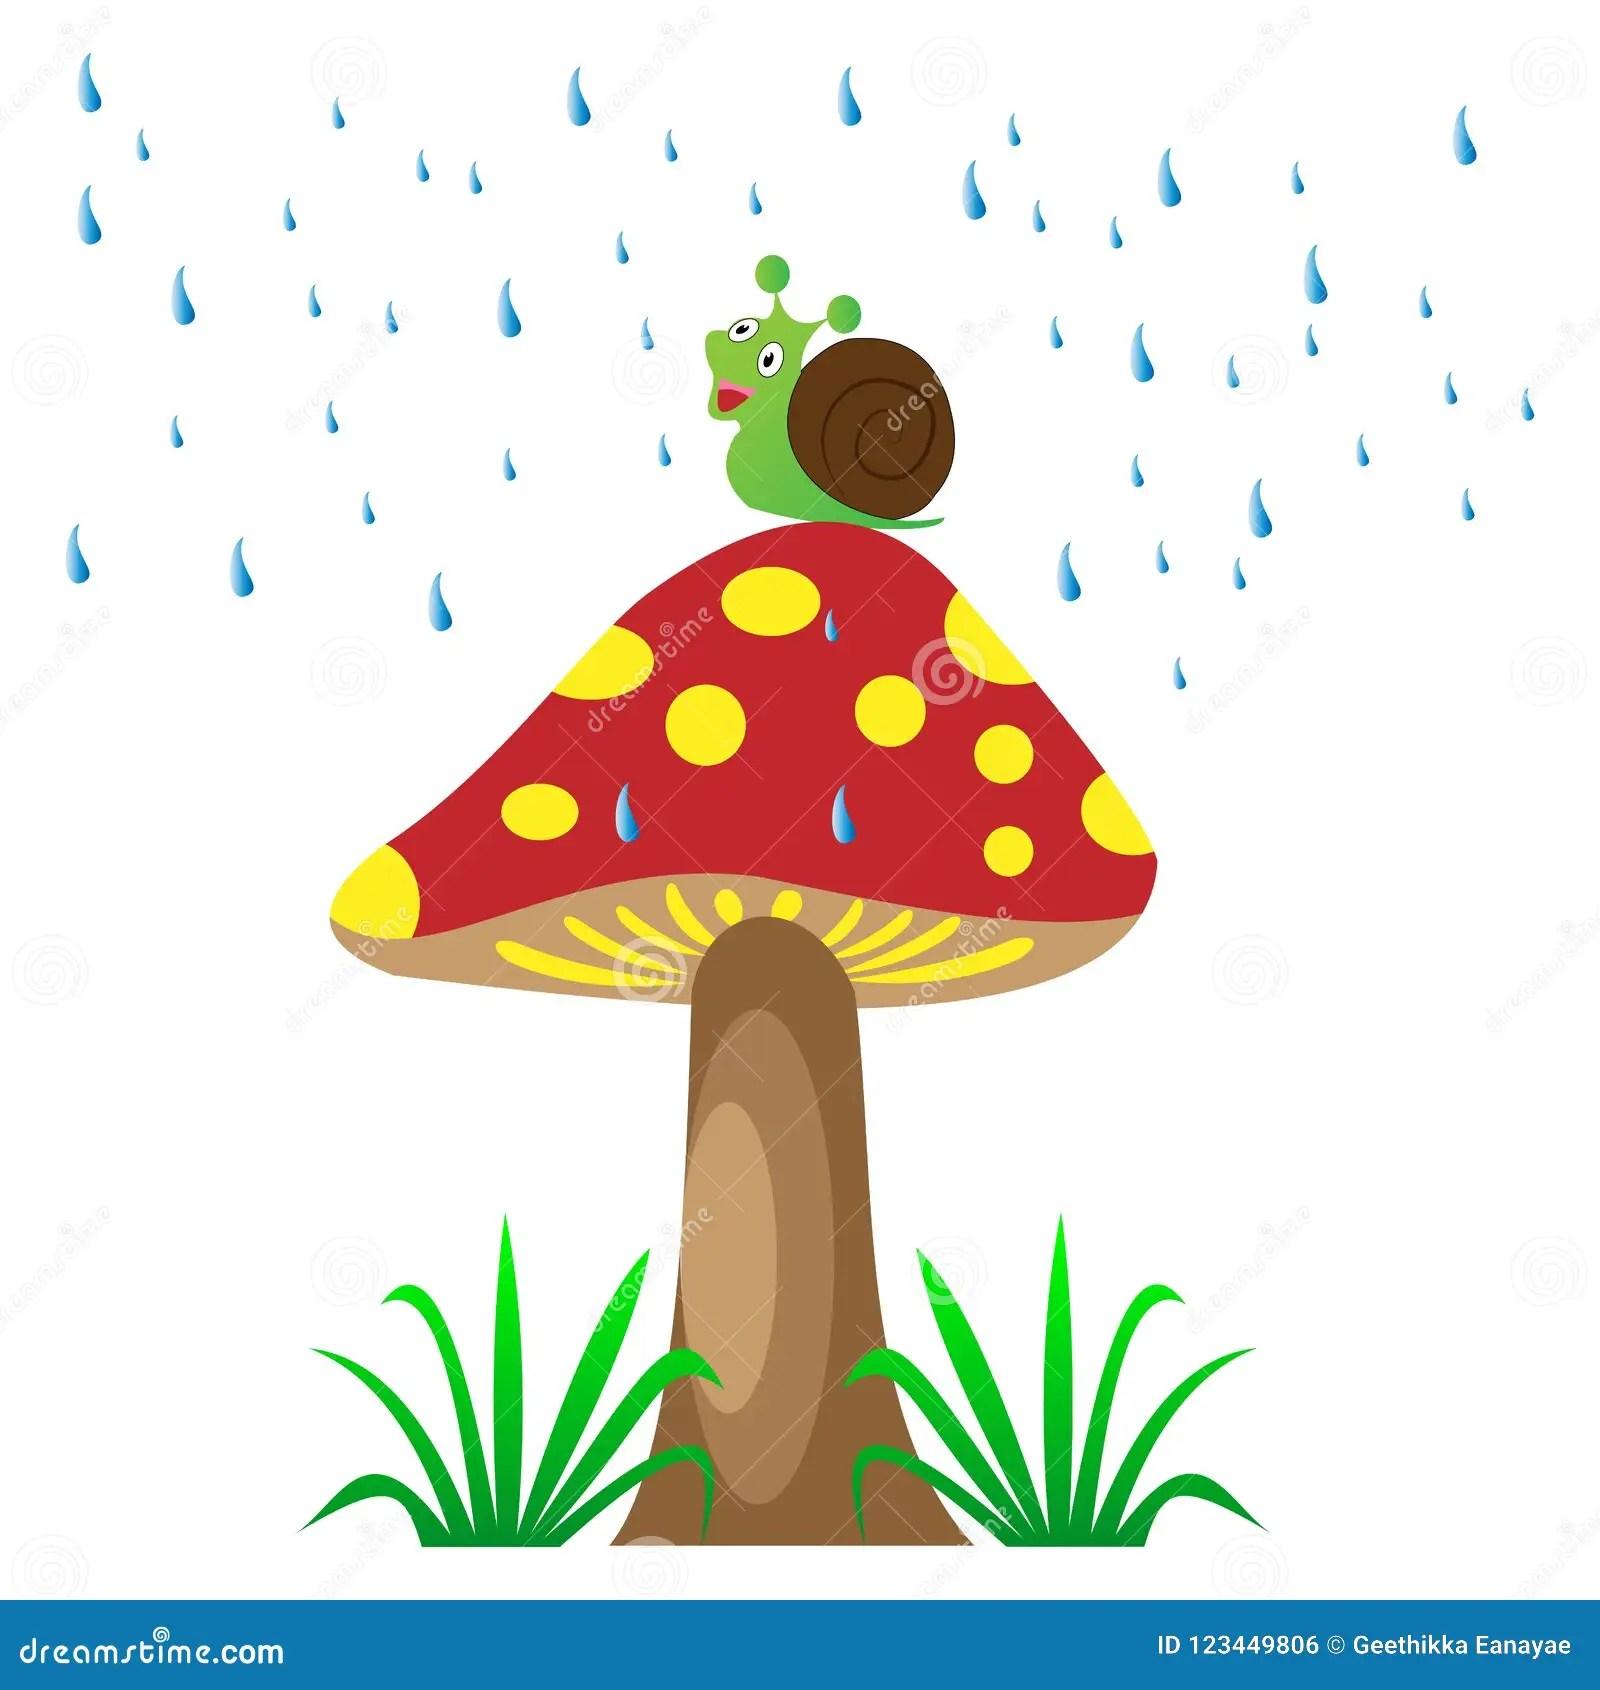 Mushroom In The Rain With The Snail Stock Vector